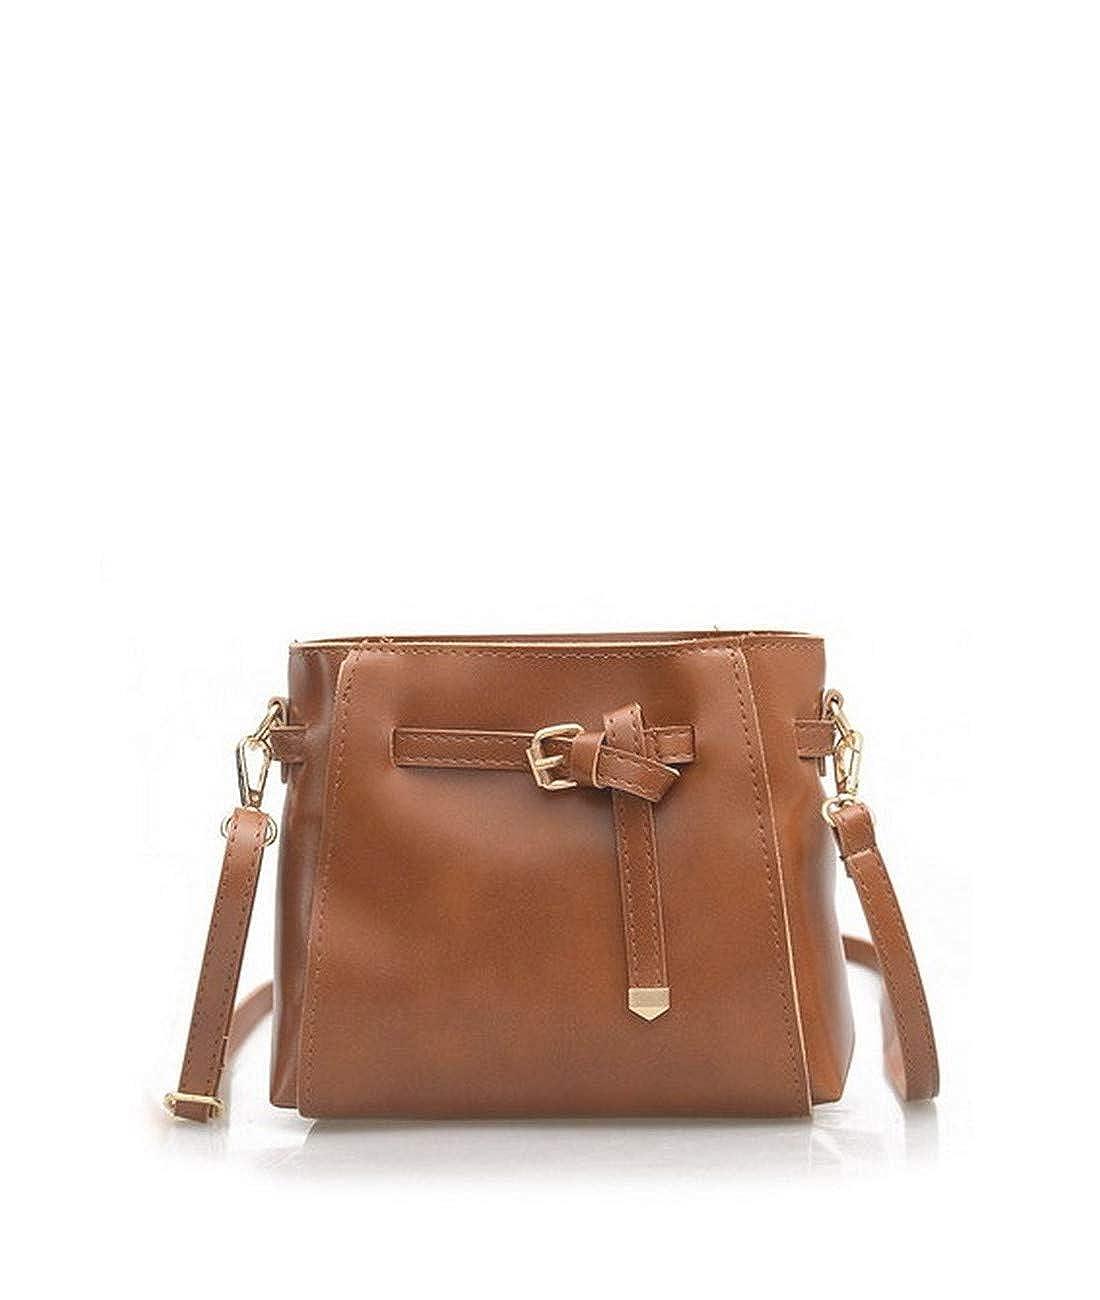 K.X.S Christmas Gifts Womens Crossbody Bag Vogue Unique Design Solid Soft Casual Bag